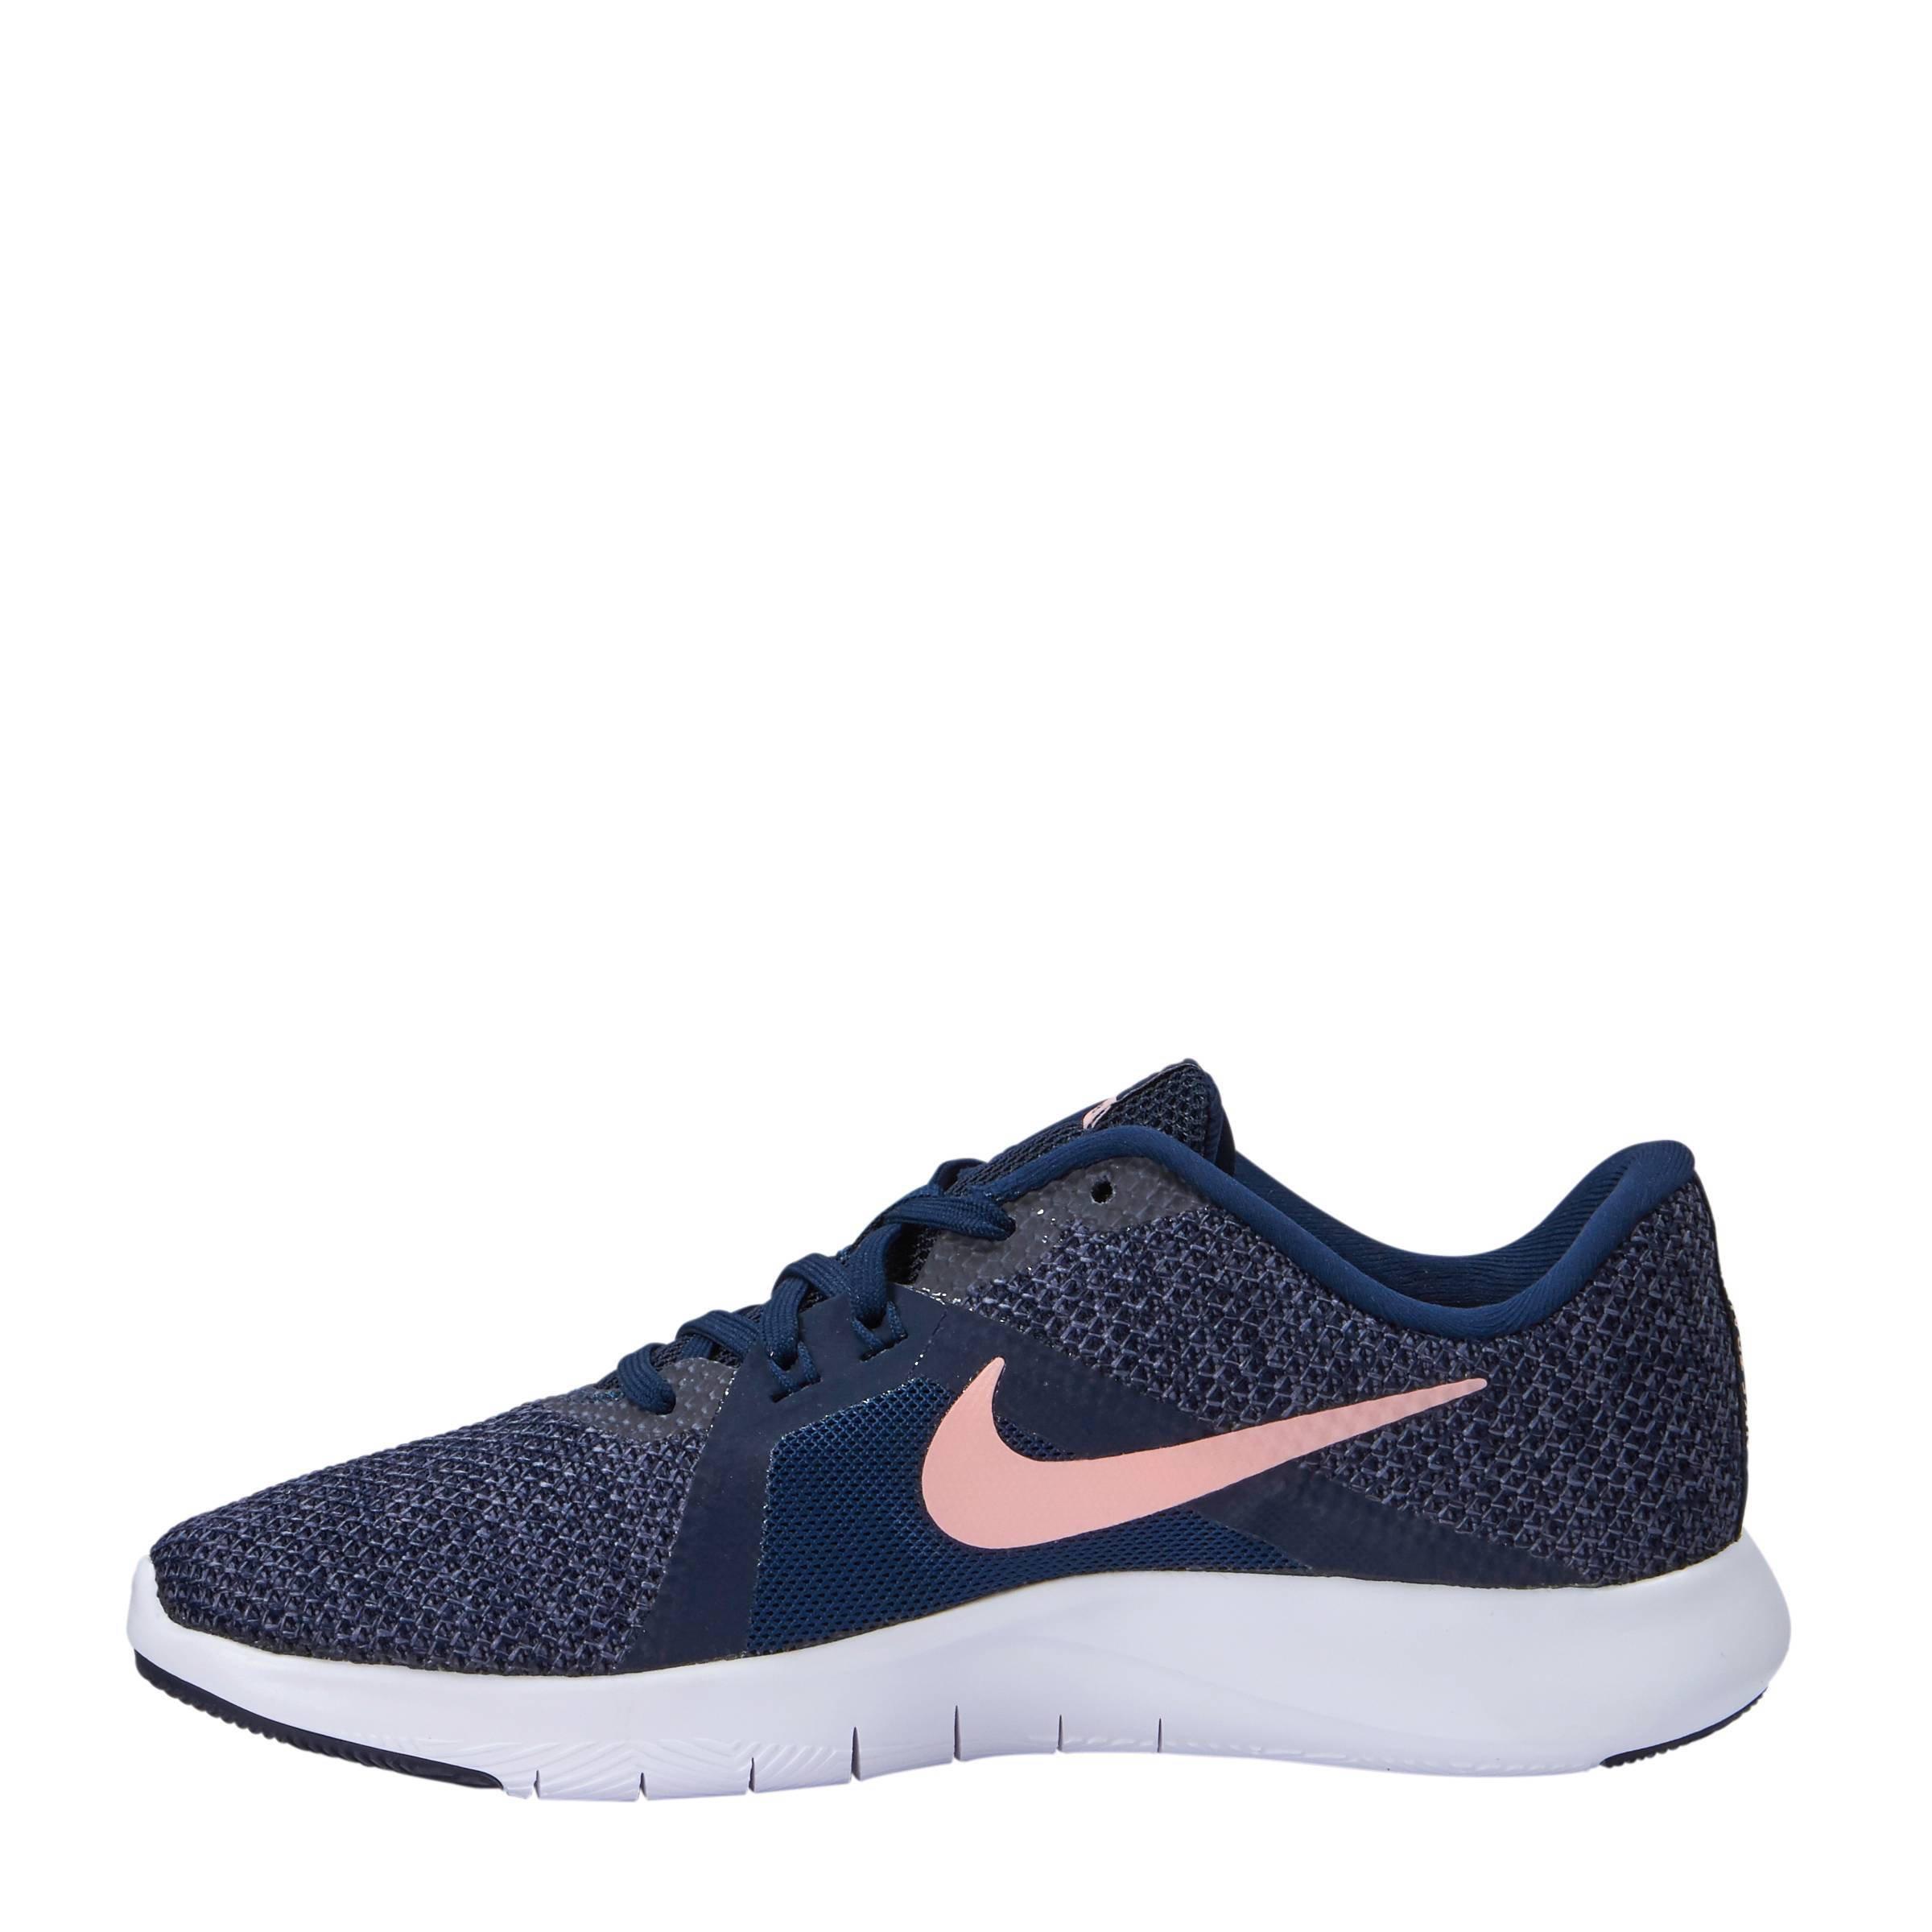 df7ed0134 nike-flex-trainer-8-fitness-schoenen-donkerblauw-0191884334517.jpg